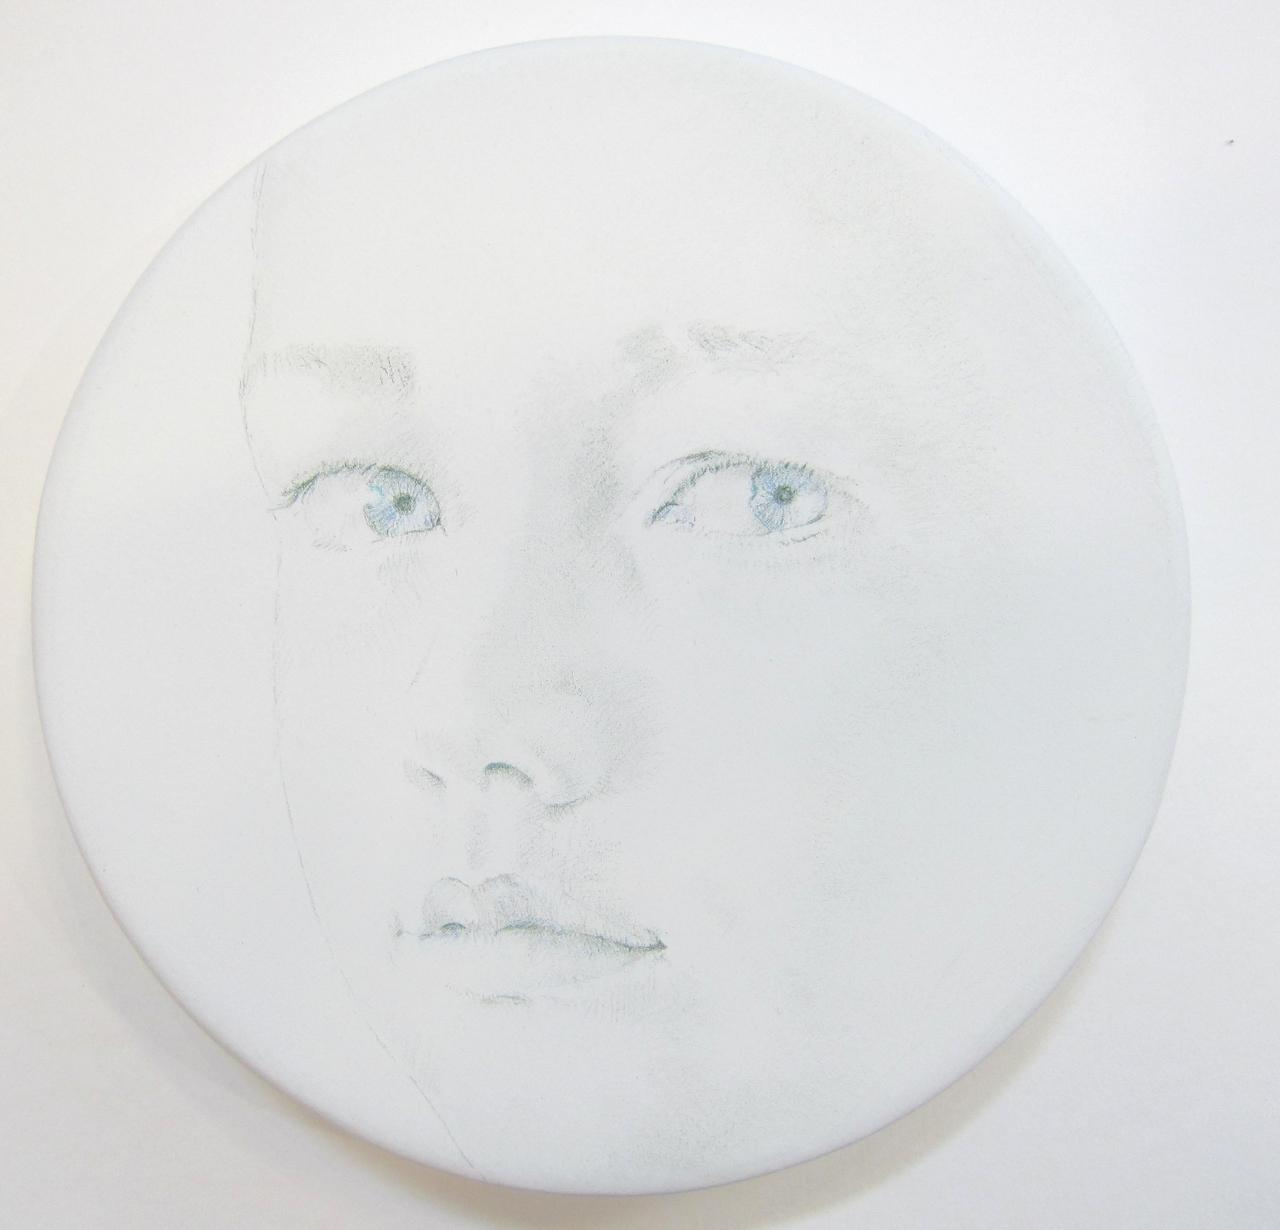 White Tondo No. 11